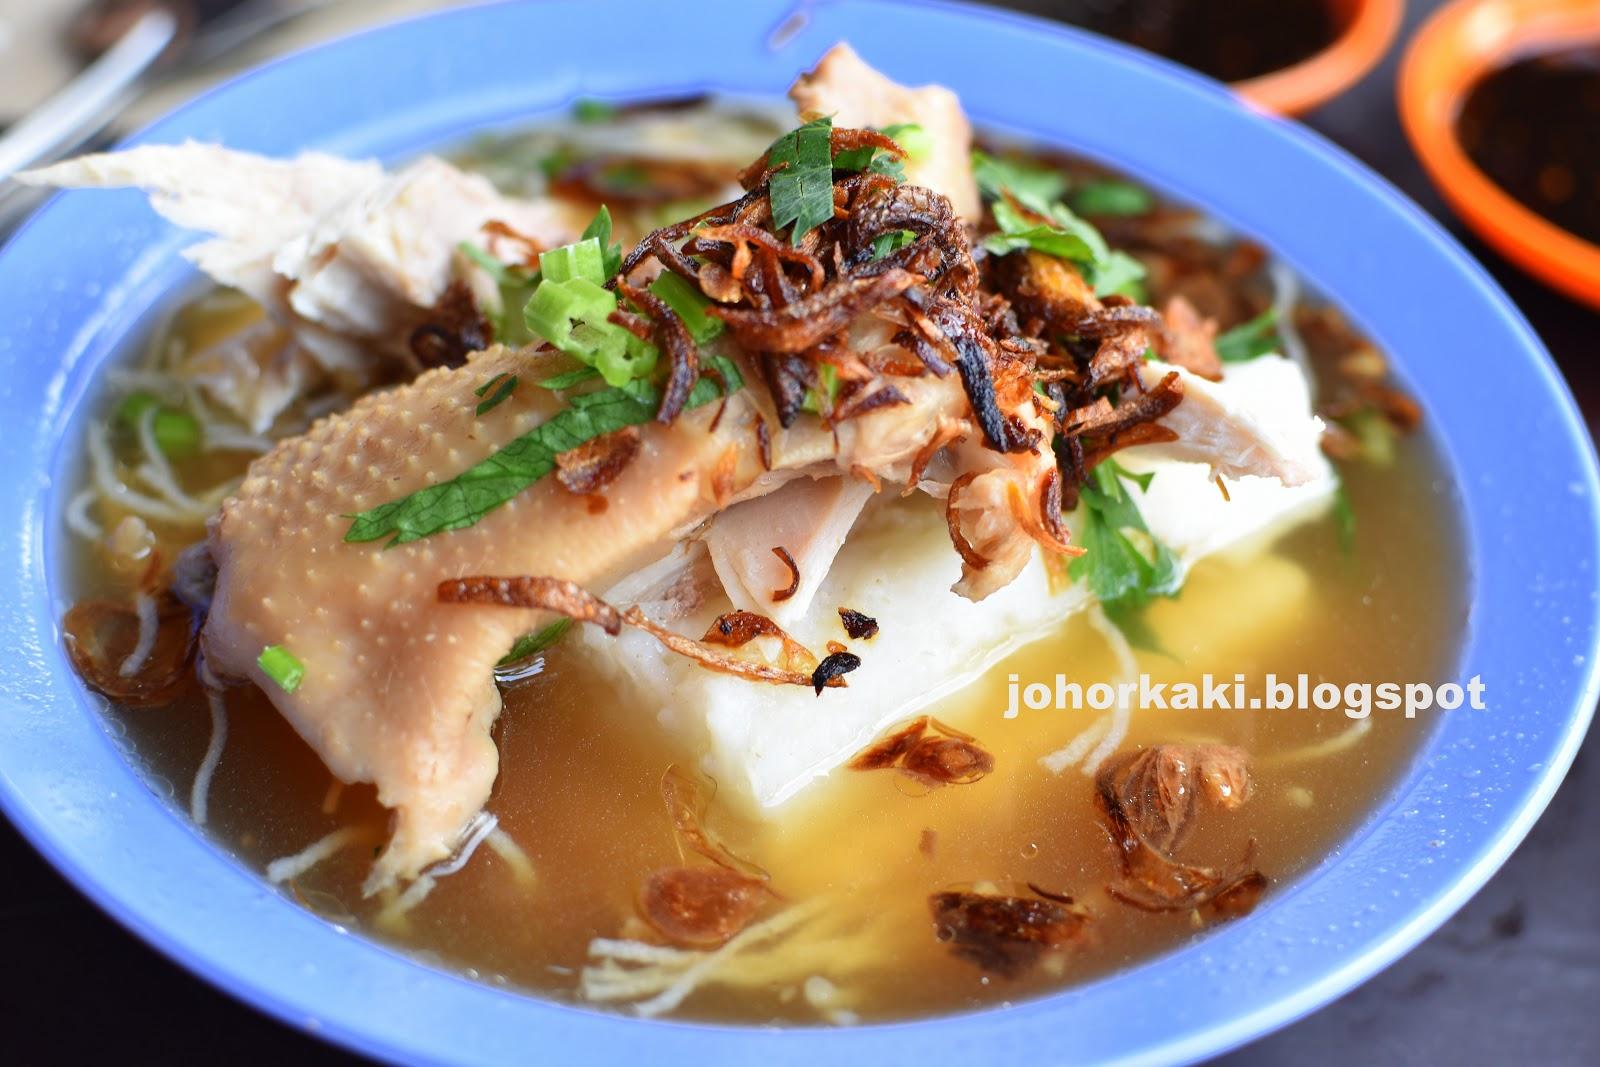 Warung kurniawan soto and sup tulang in johor bahru jk1478 for Cuisine kaki